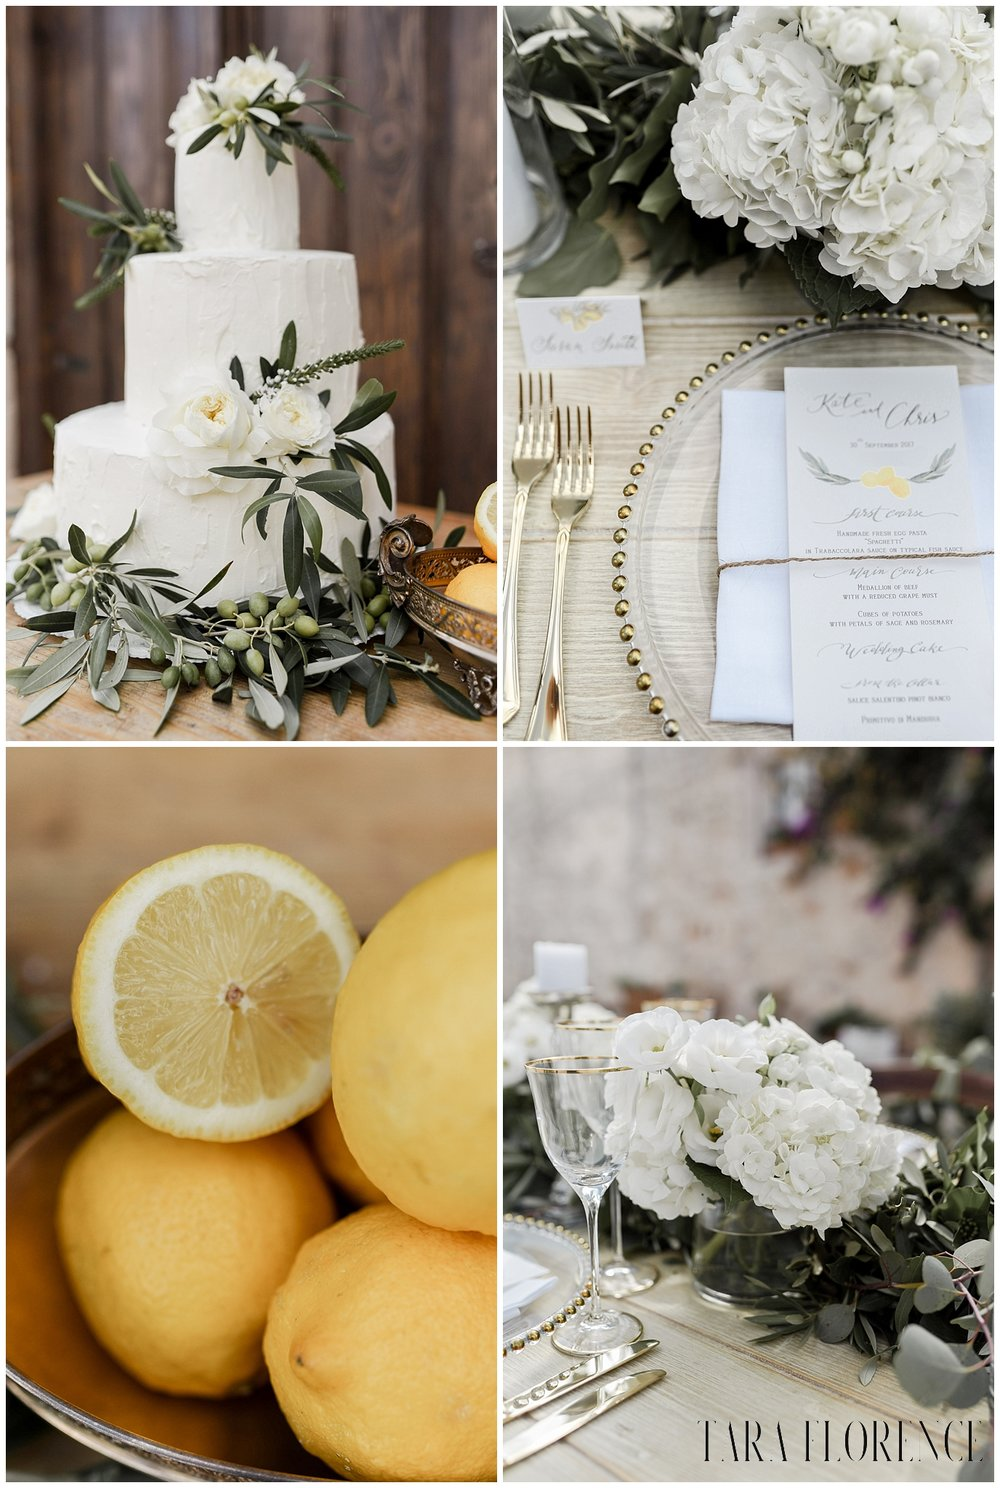 Puglia-Tara-Florence-Bridal-Editorial-117_WEB.jpg